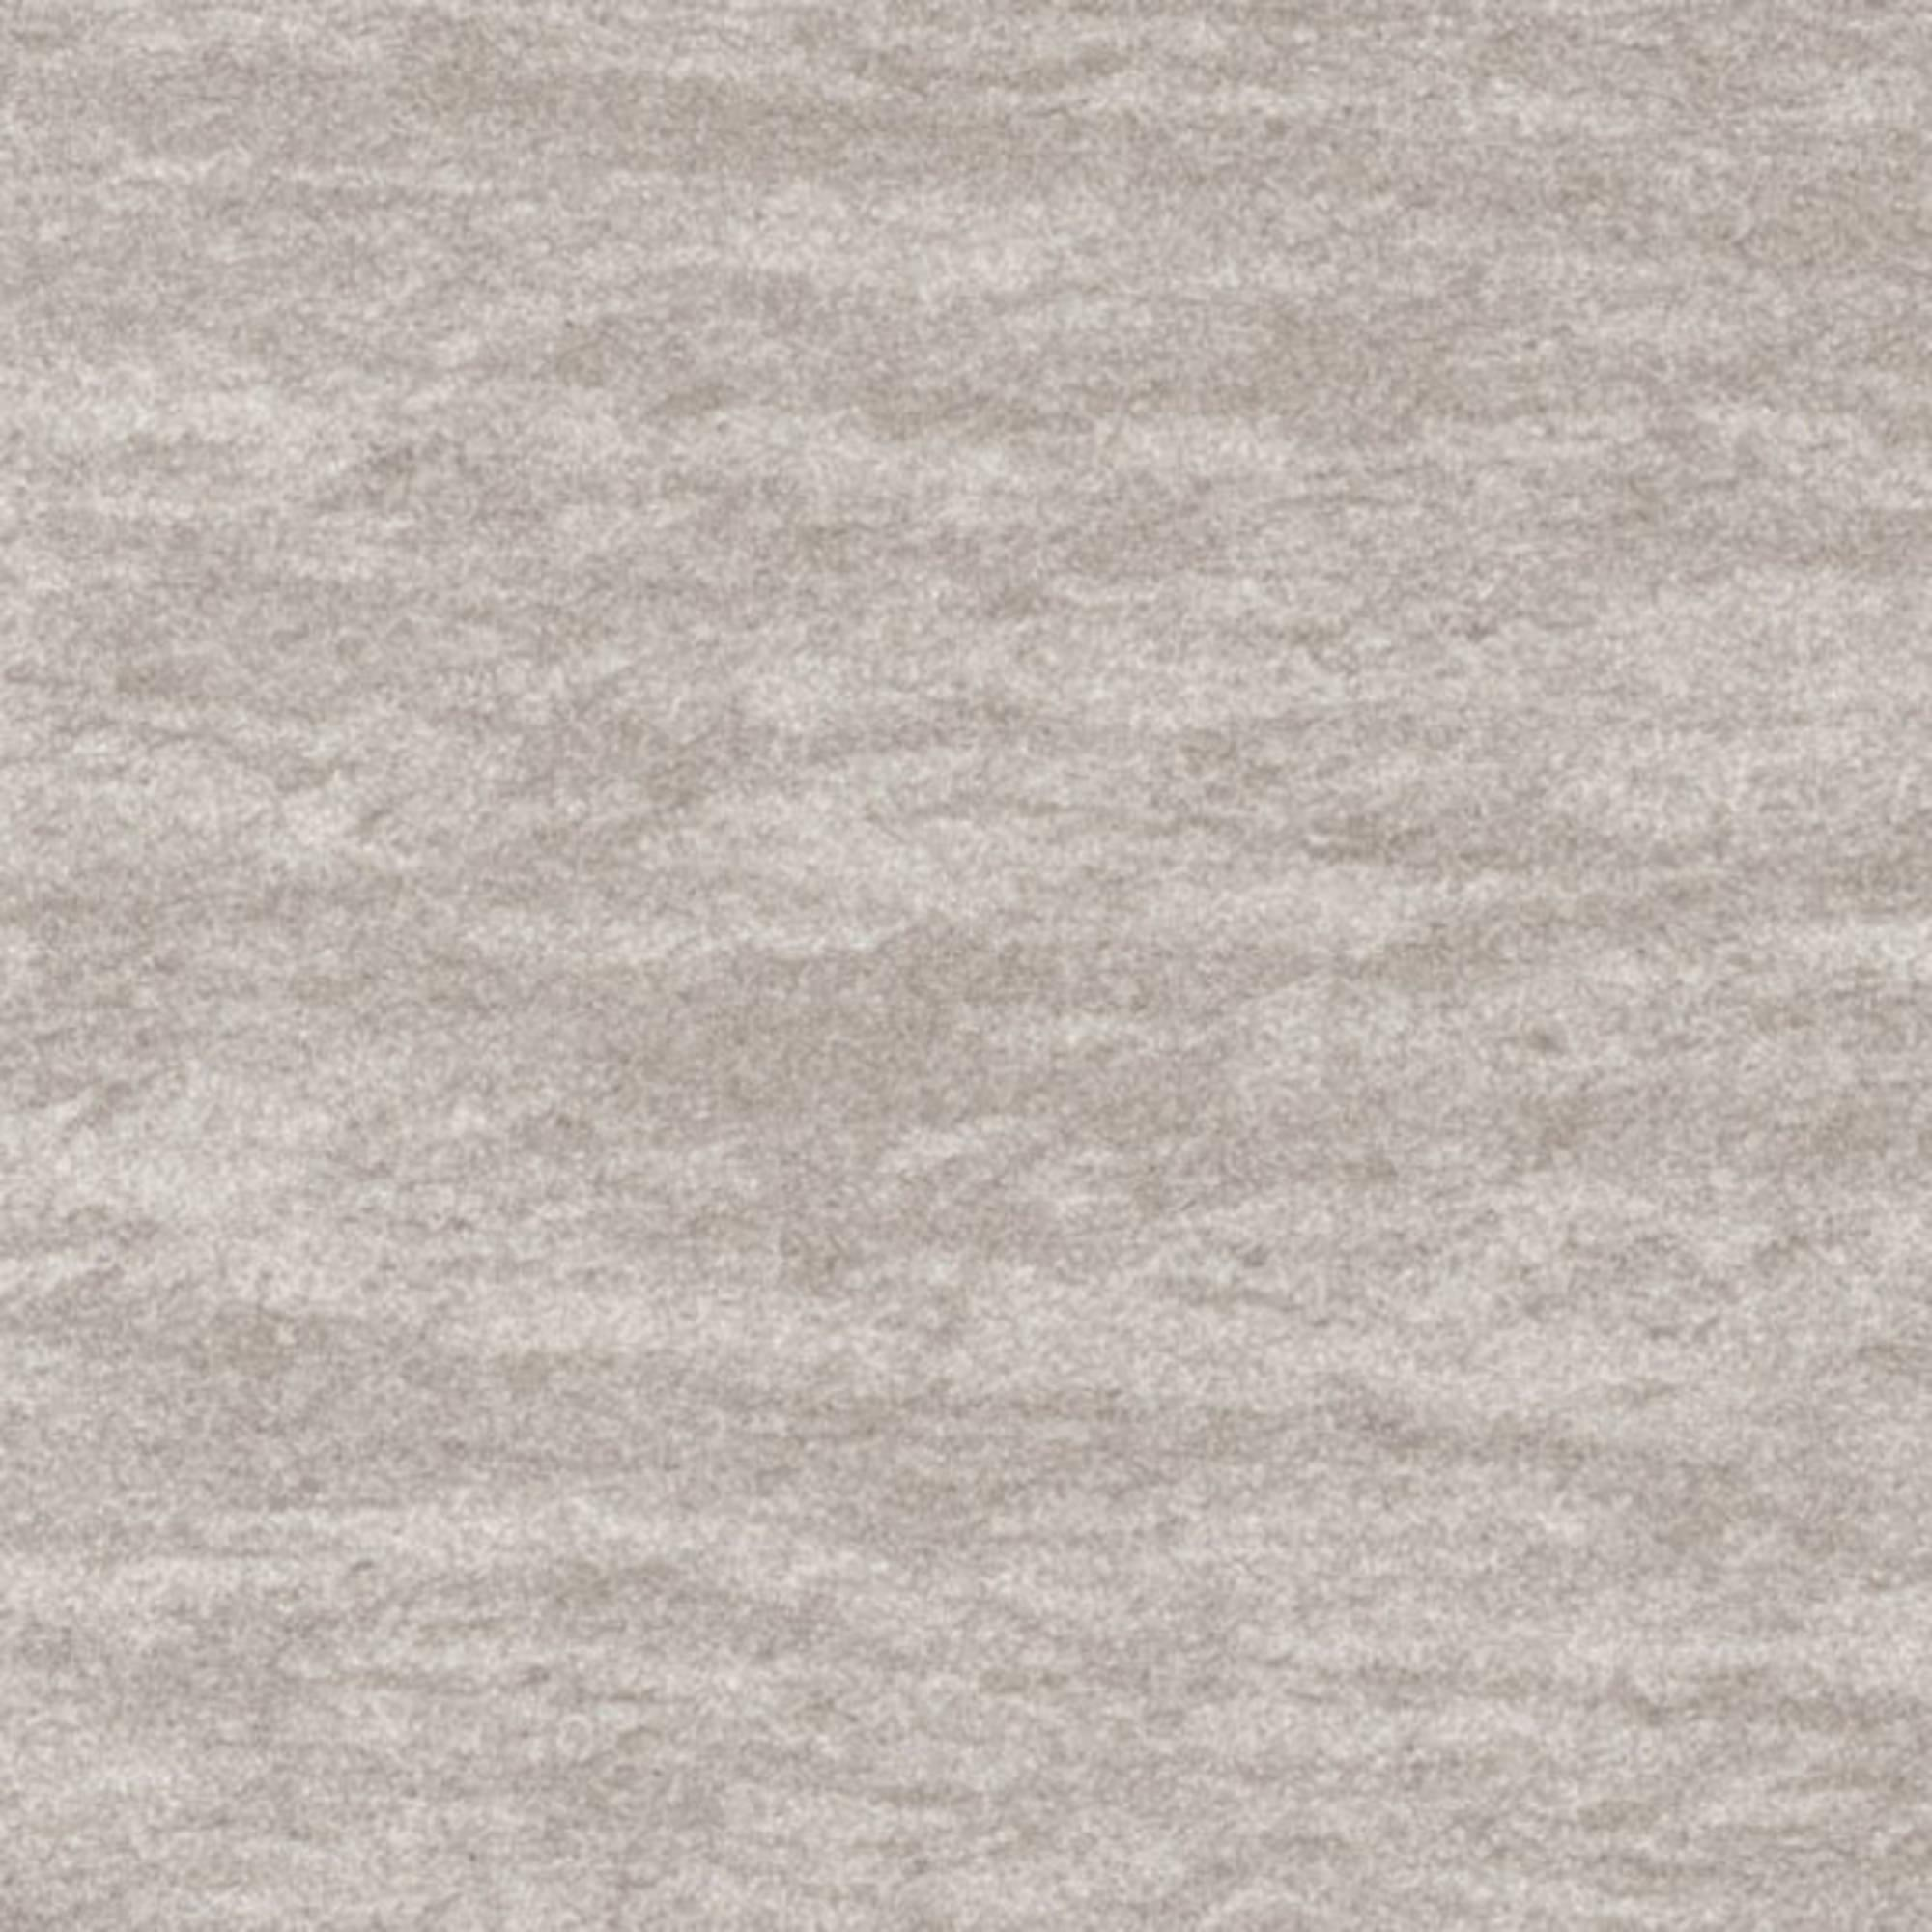 Vloertegel Coem Pietra Valmalenco 60x60x- cm Grigio 1,44M2